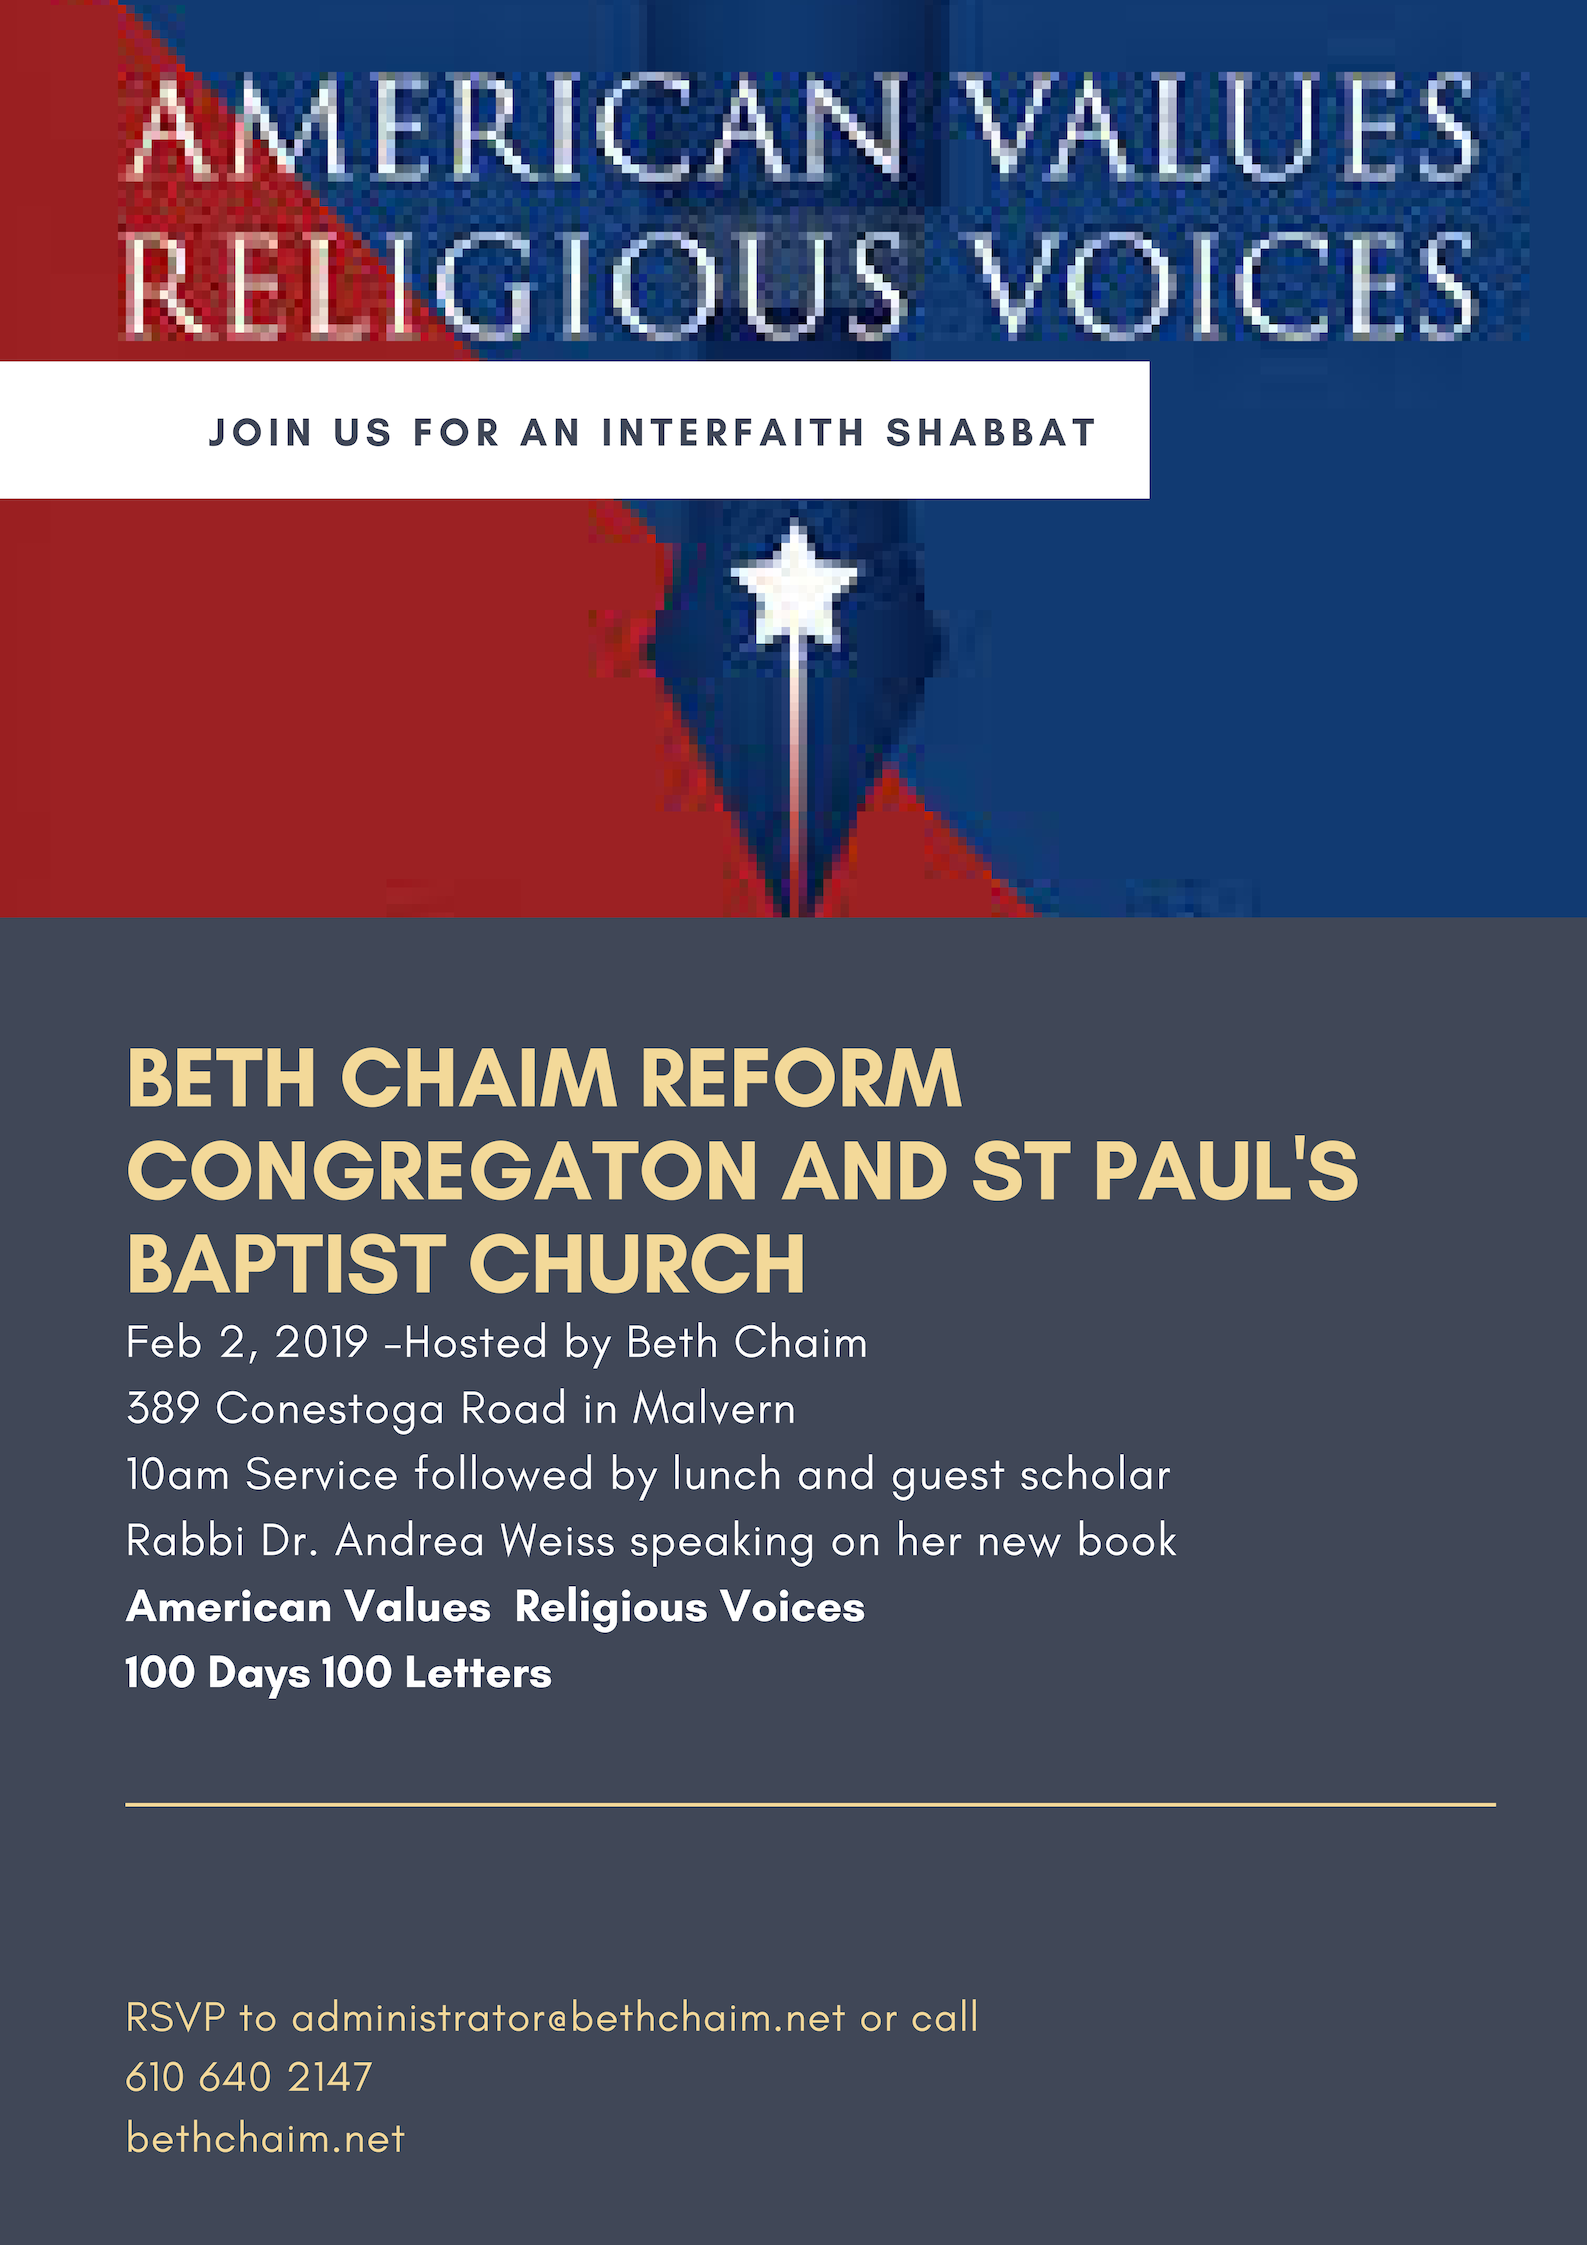 Interfaith Shabbat Poster.png